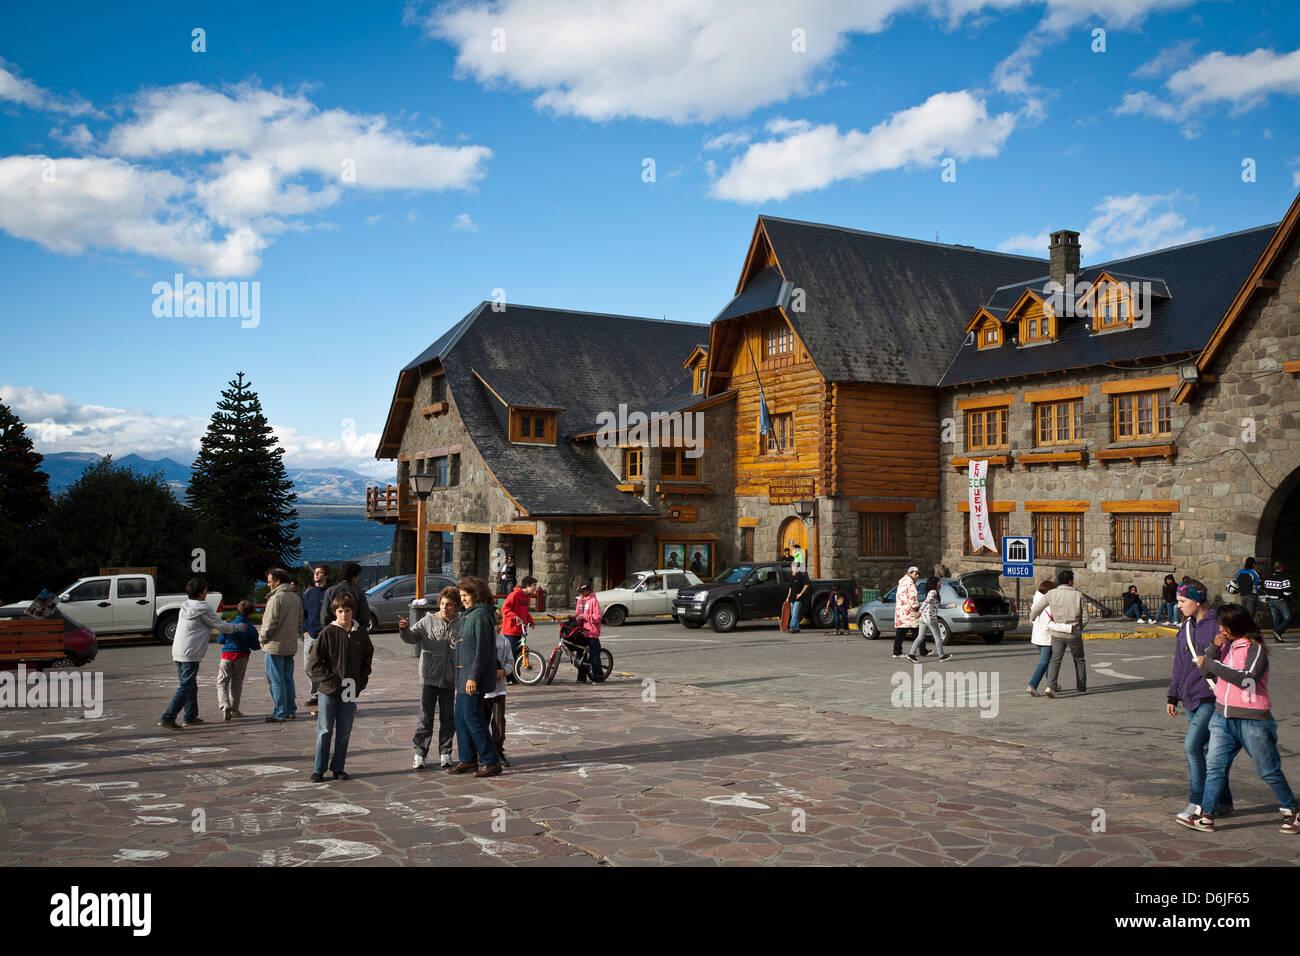 Cenro Civico, the main town hall in Bariloche, Patagonia, Argentina, South America - Stock Image